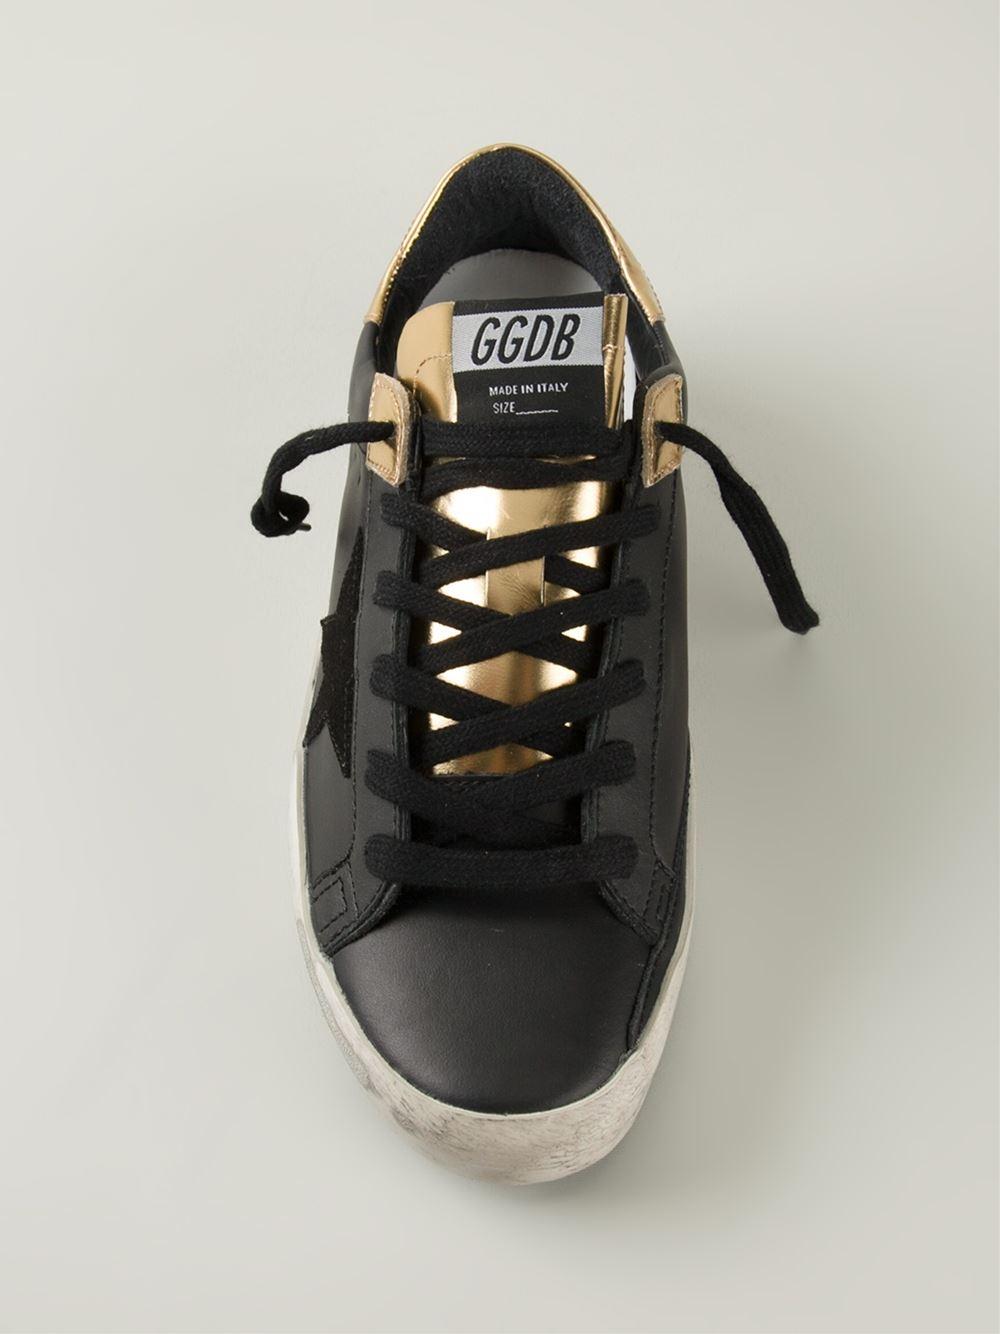 Golden Goose Deluxe Brand 'Superstar Records Edition' Sneakers in Black